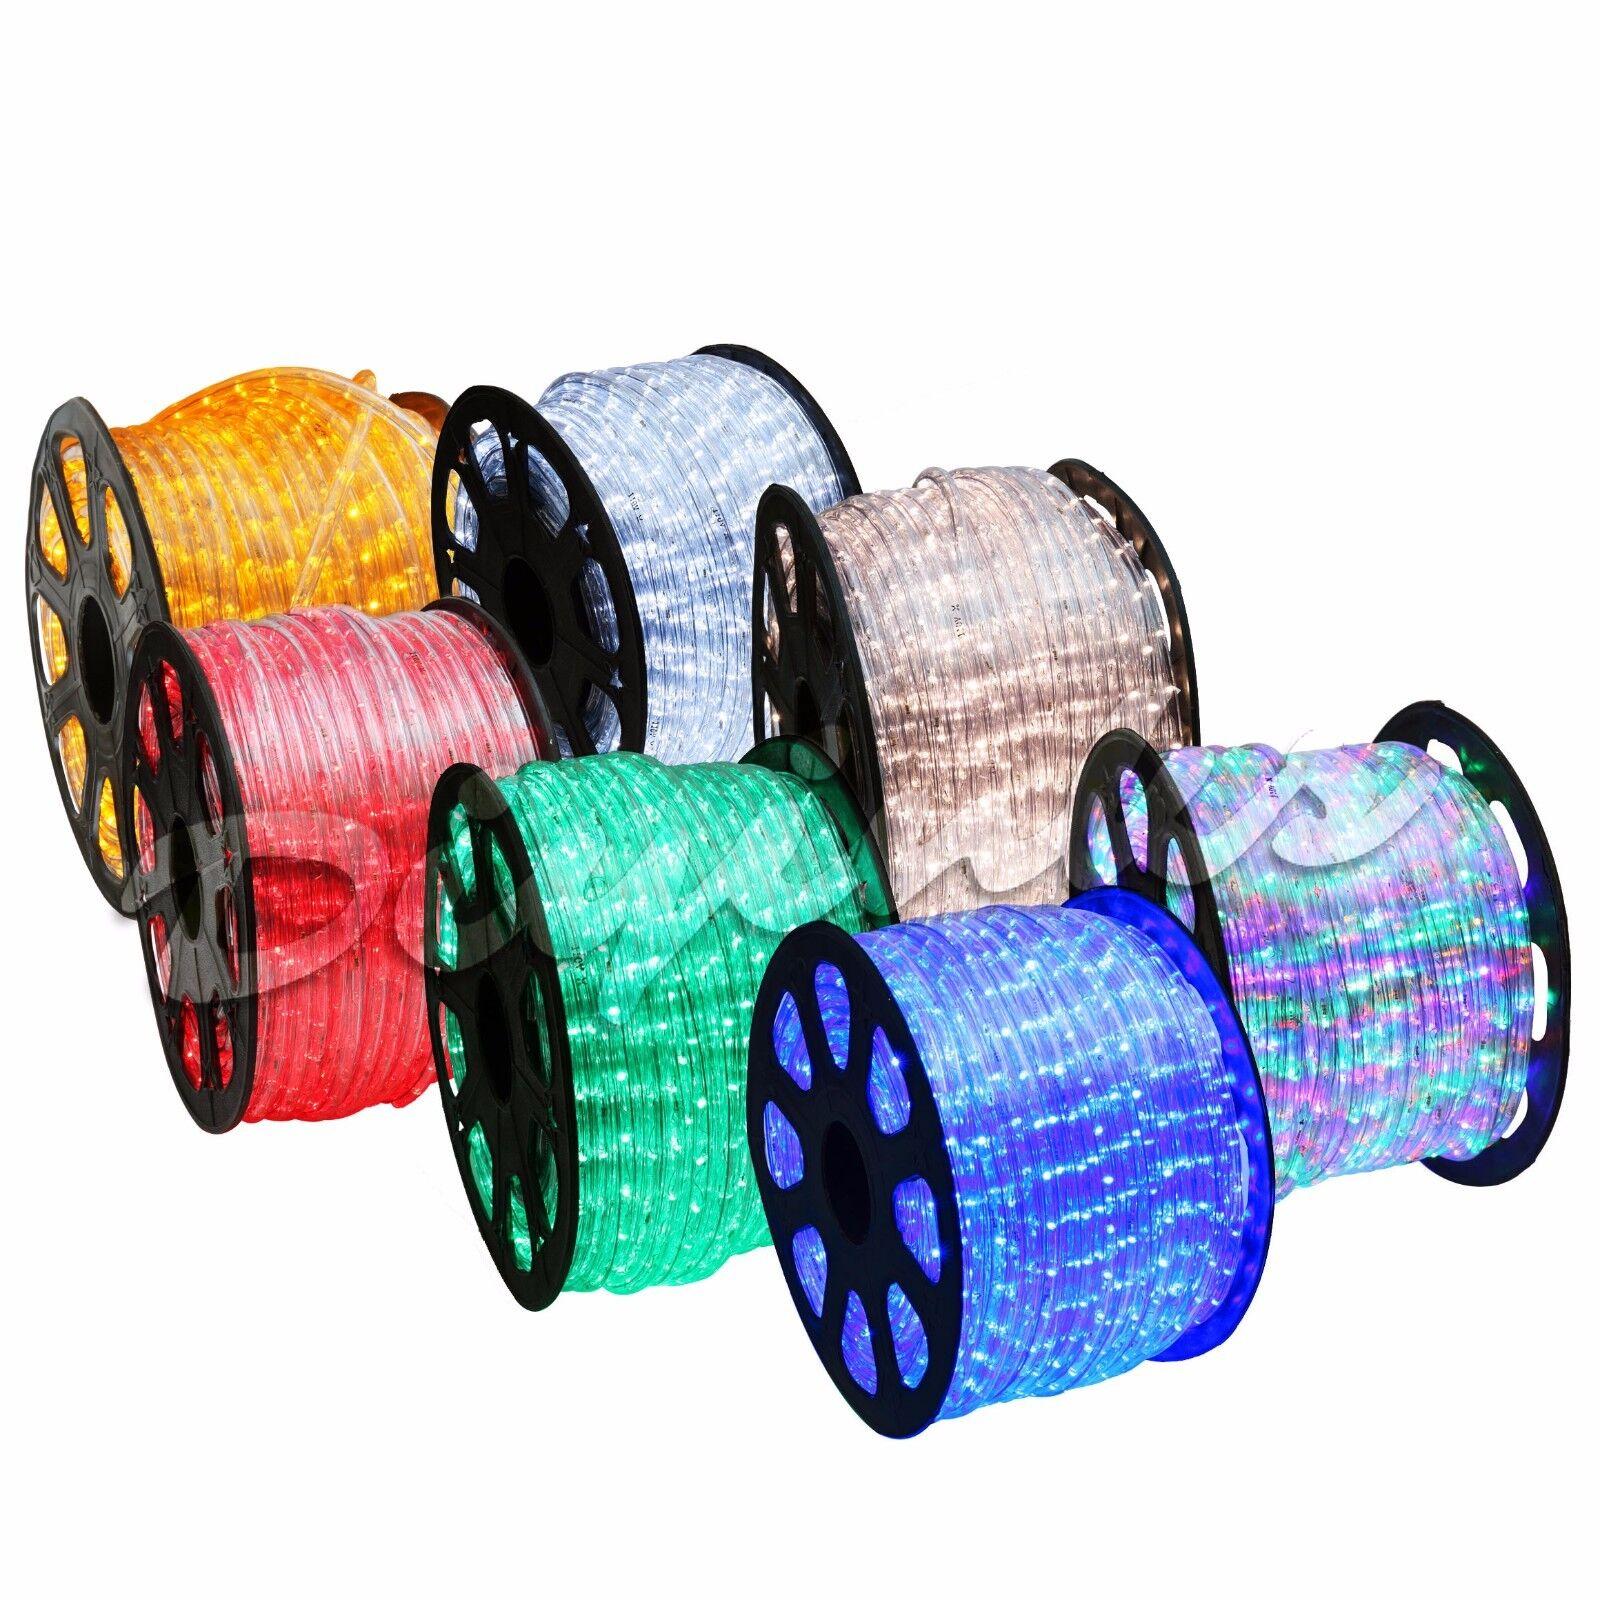 led rope light 2 wire 110v lig... Image 2